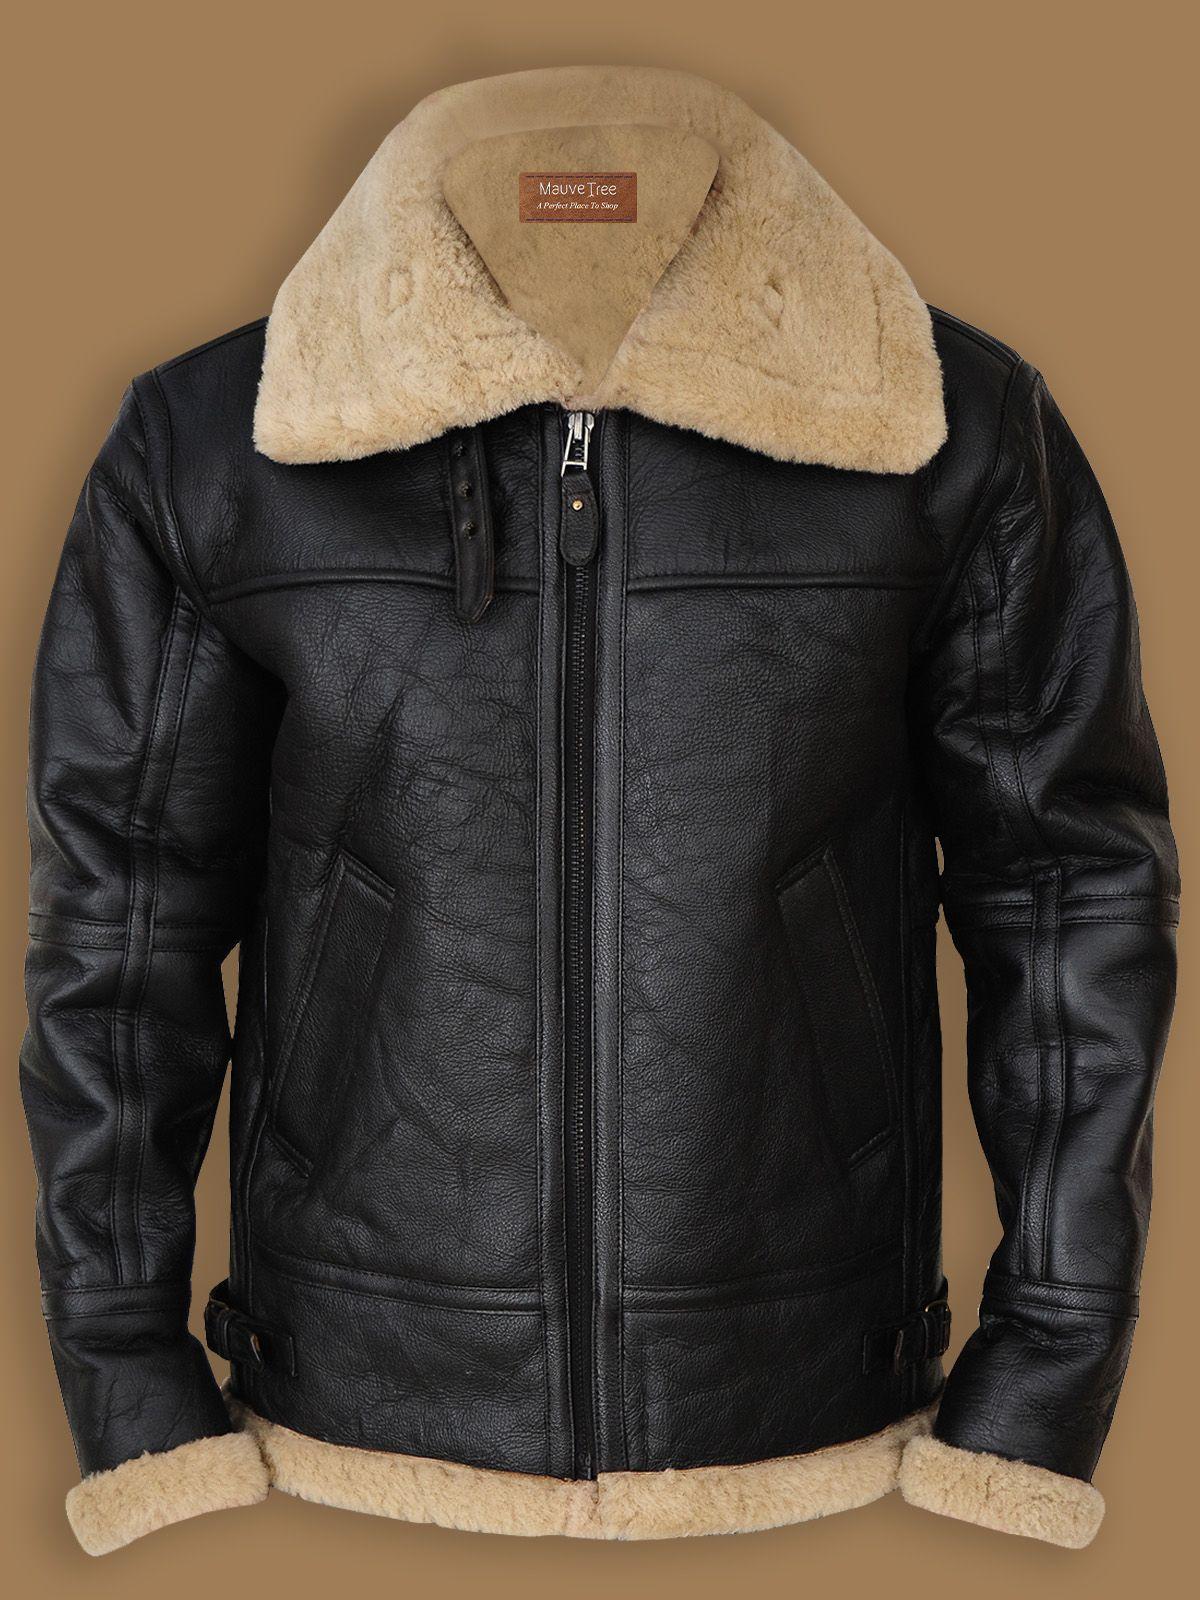 Black B3 Bomber Sheepskin Leather Jacket Men Jacket Mauvetree Leather Jacket Men Bomber Jacket Fashion Sheepskin Jacket [ 1600 x 1200 Pixel ]